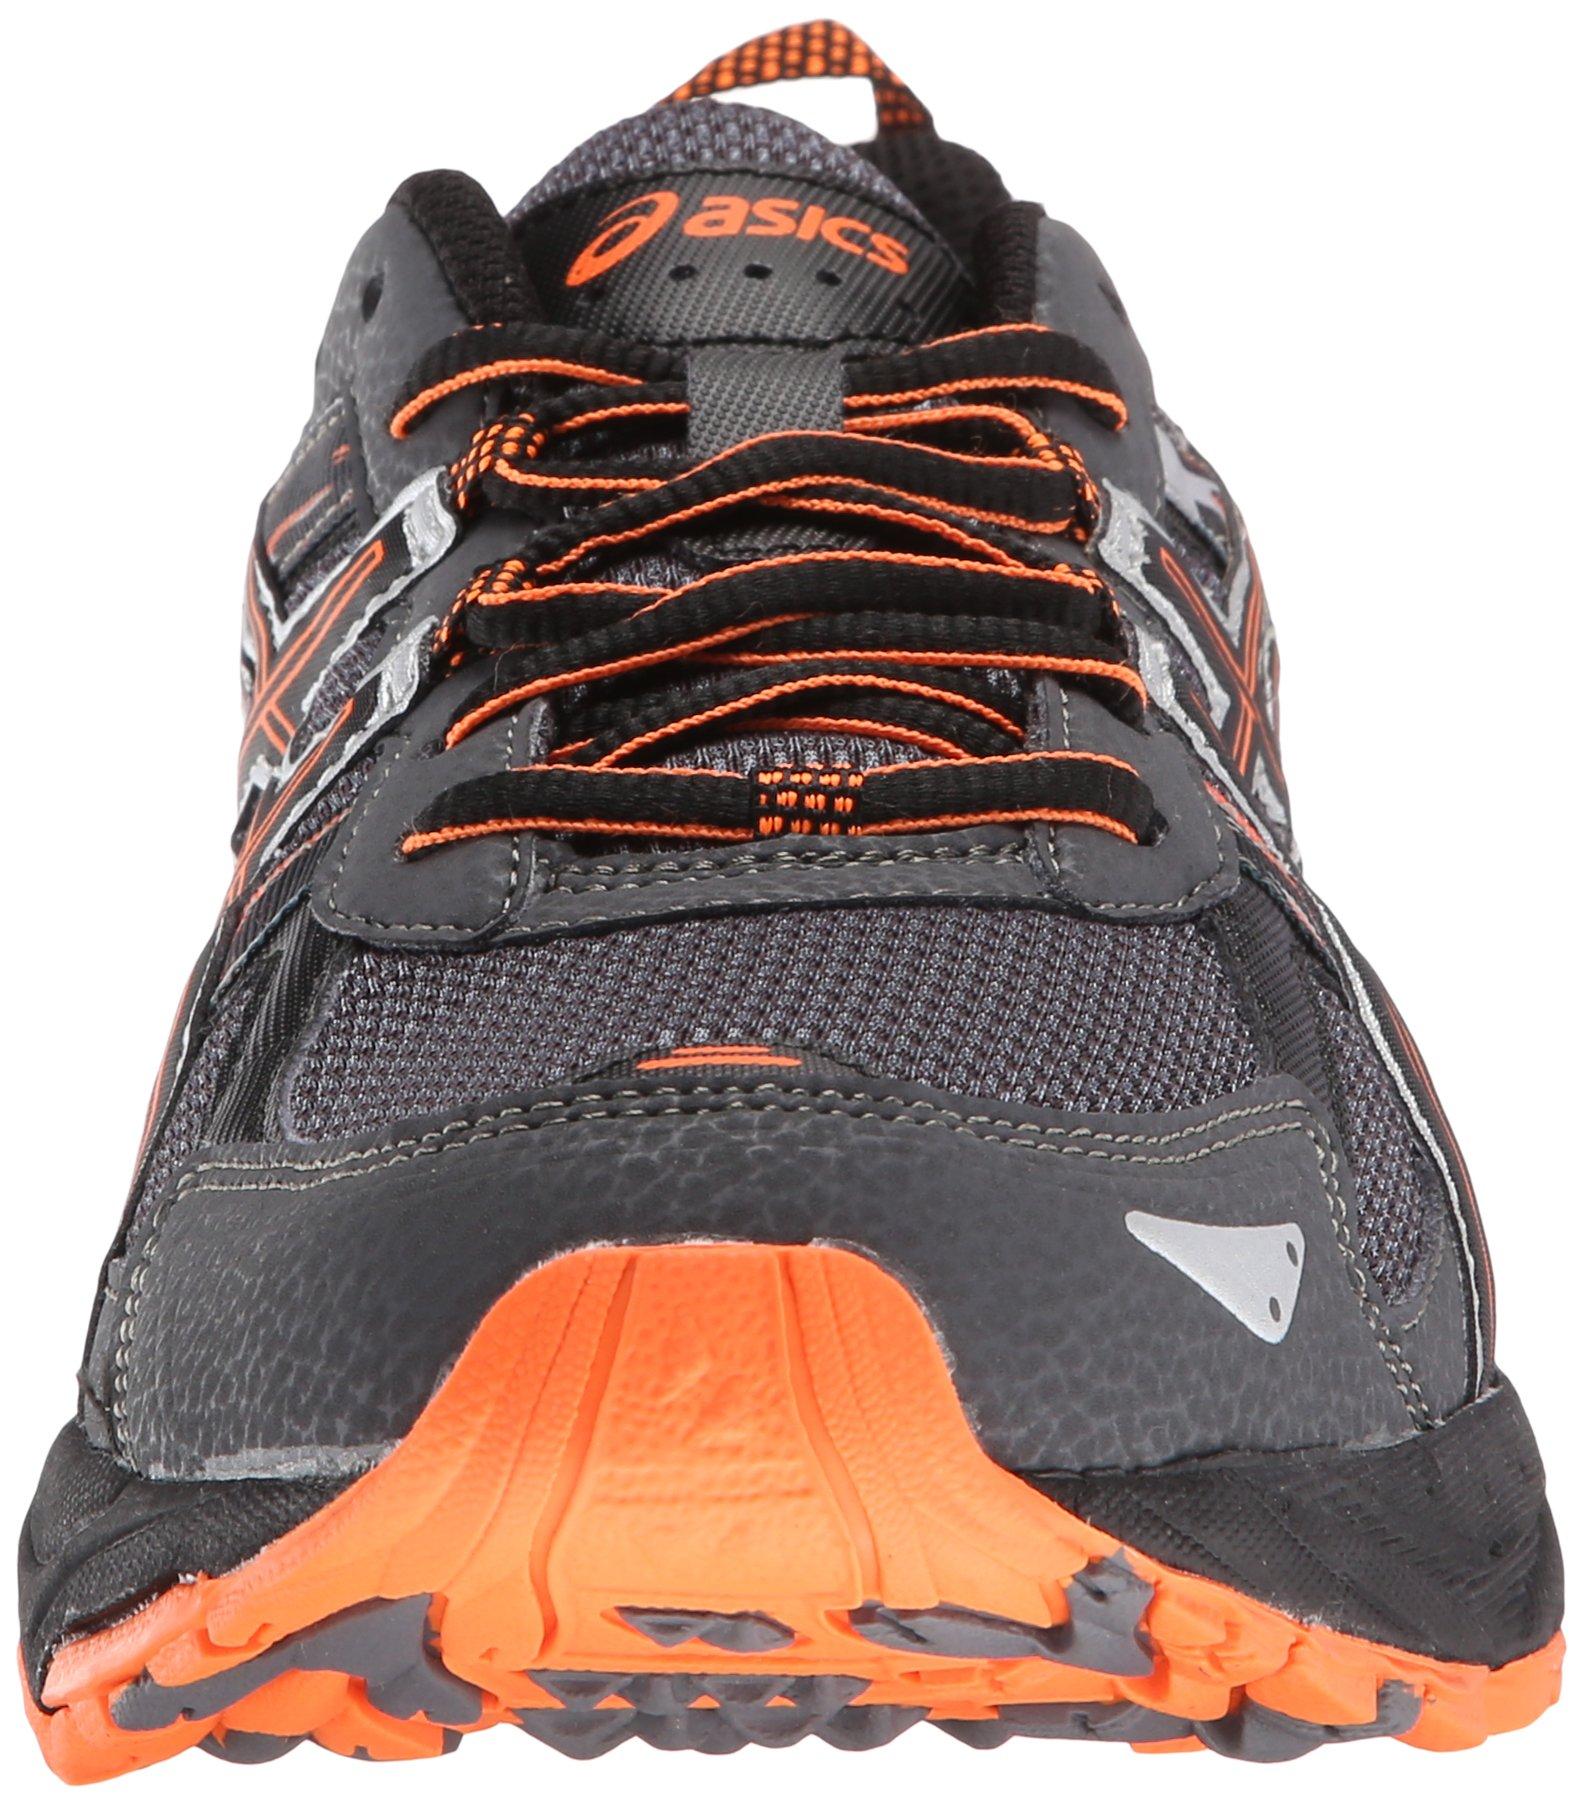 ASICS Men's Gel-Venture 5-M, Carbon/Black/Hot Orange 7.5 M US by ASICS (Image #4)